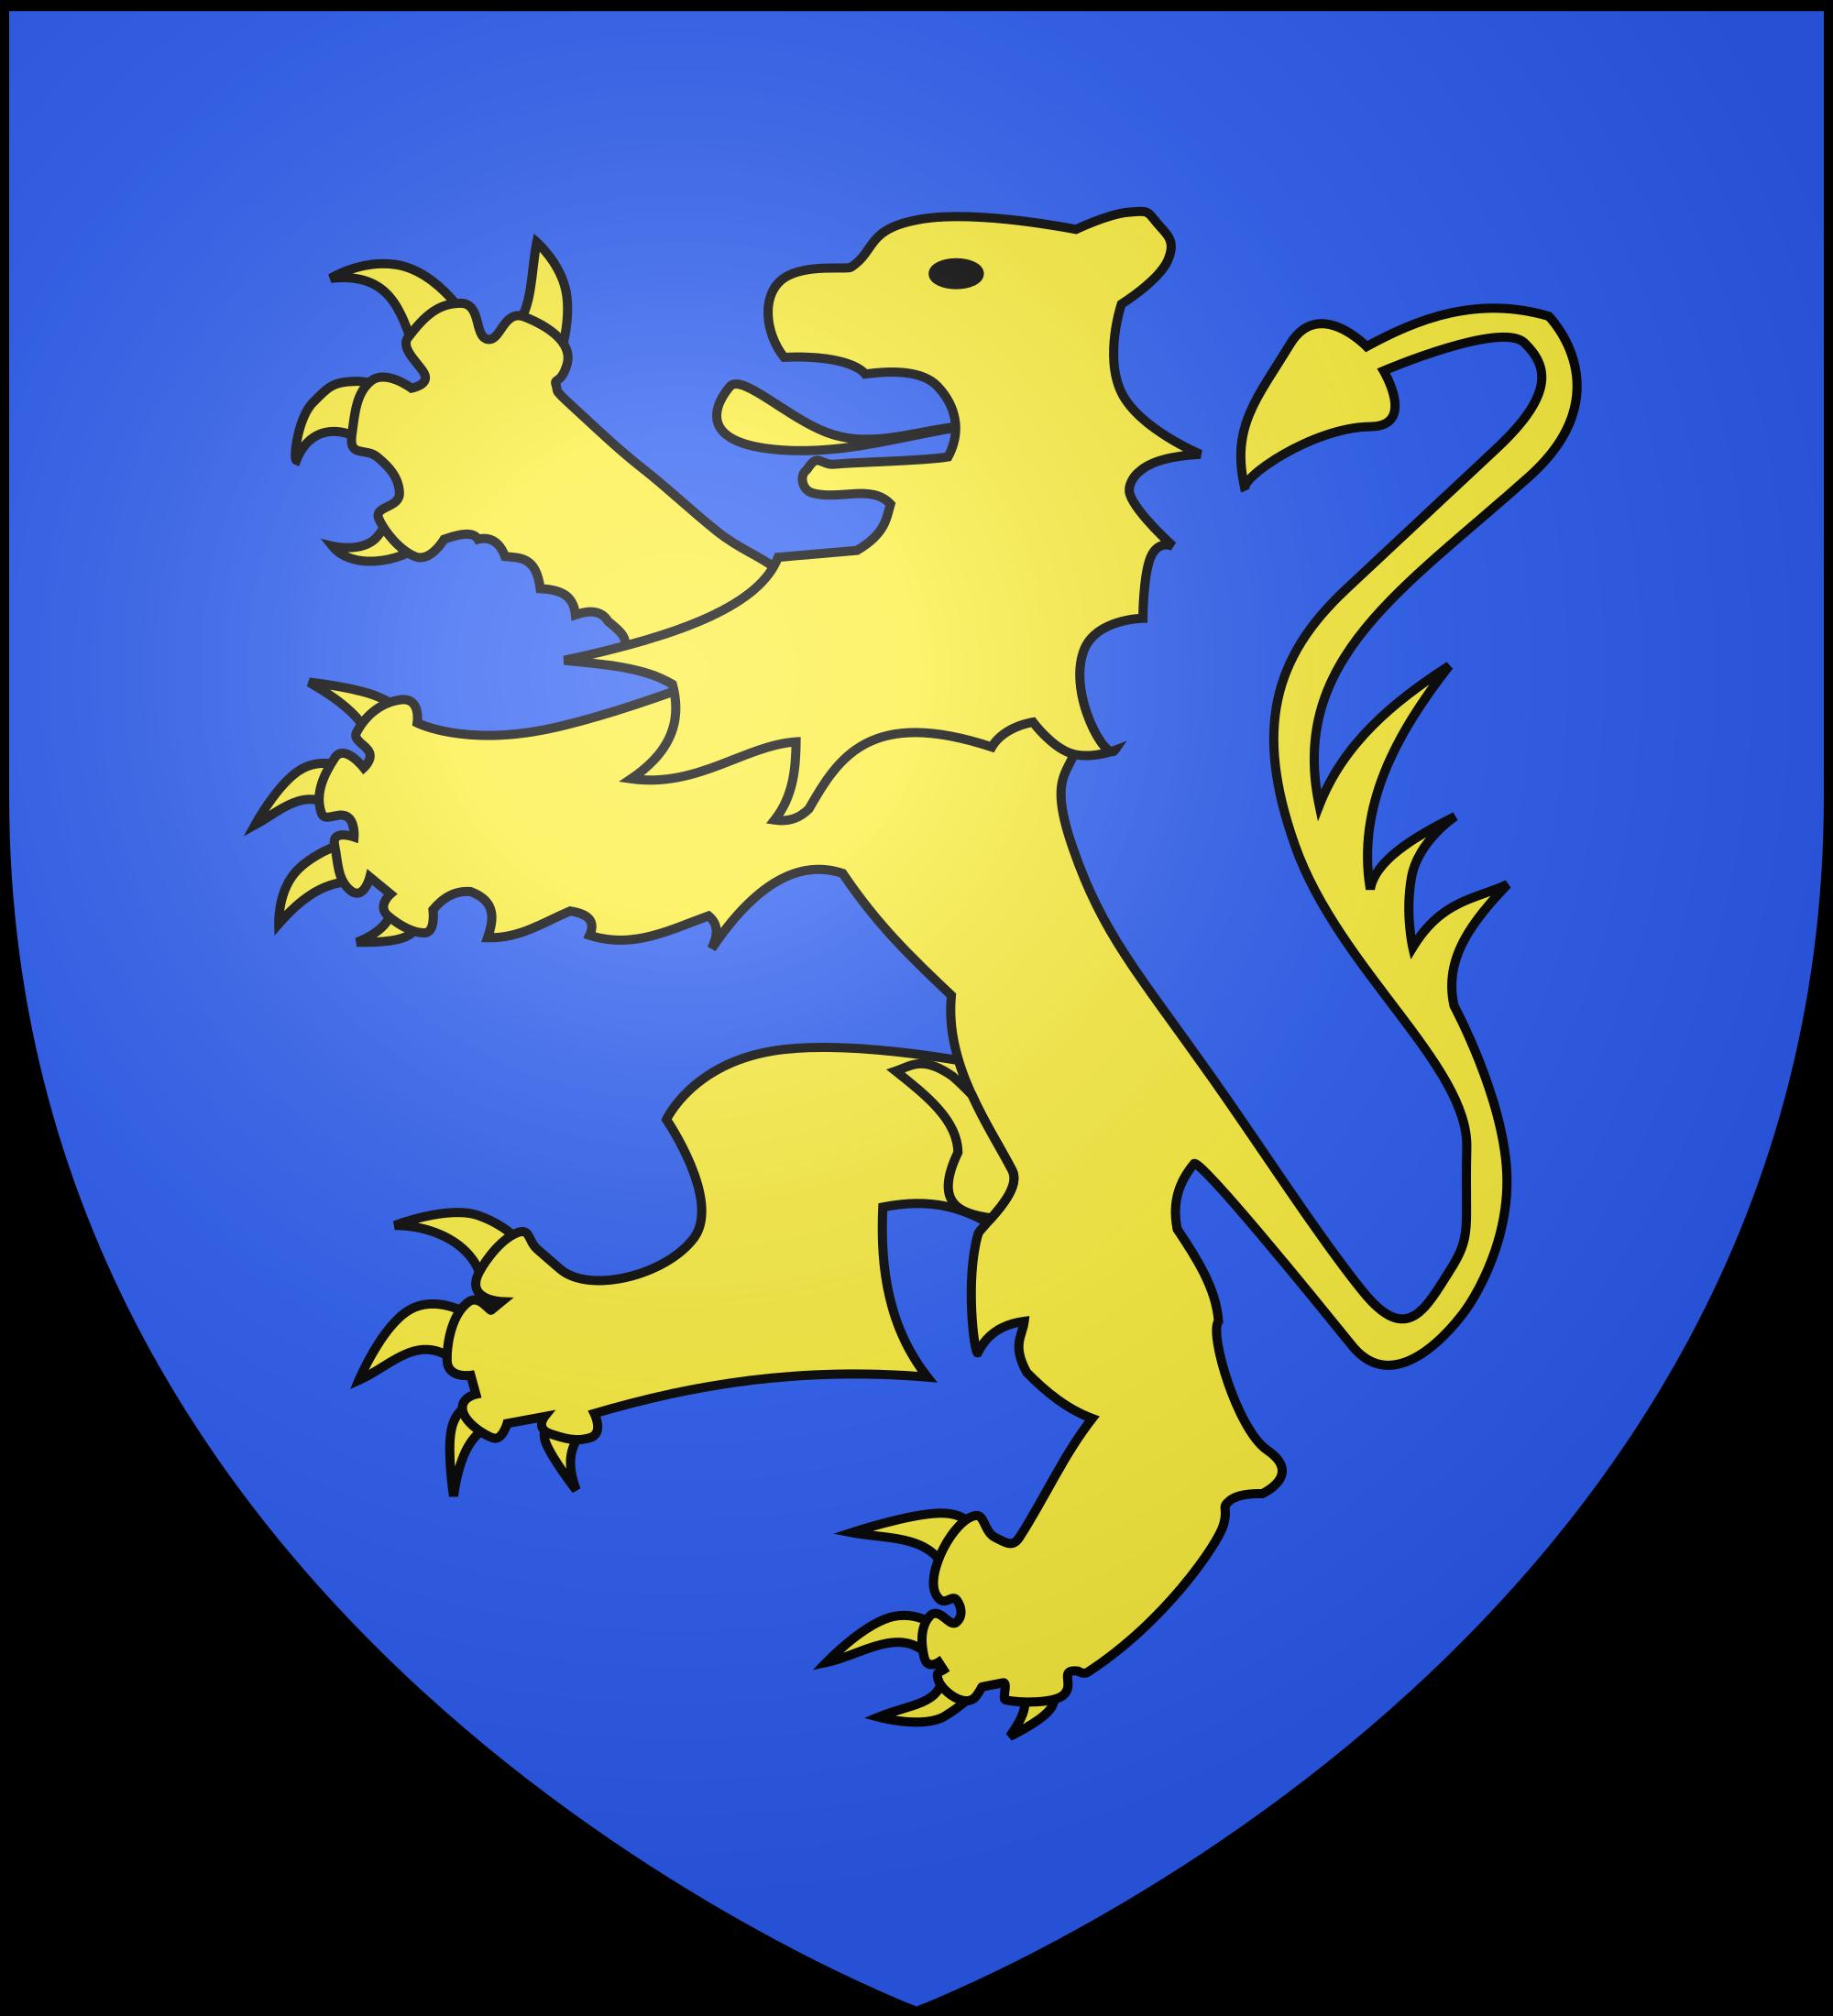 File:Armoiries de Differdange.svg.